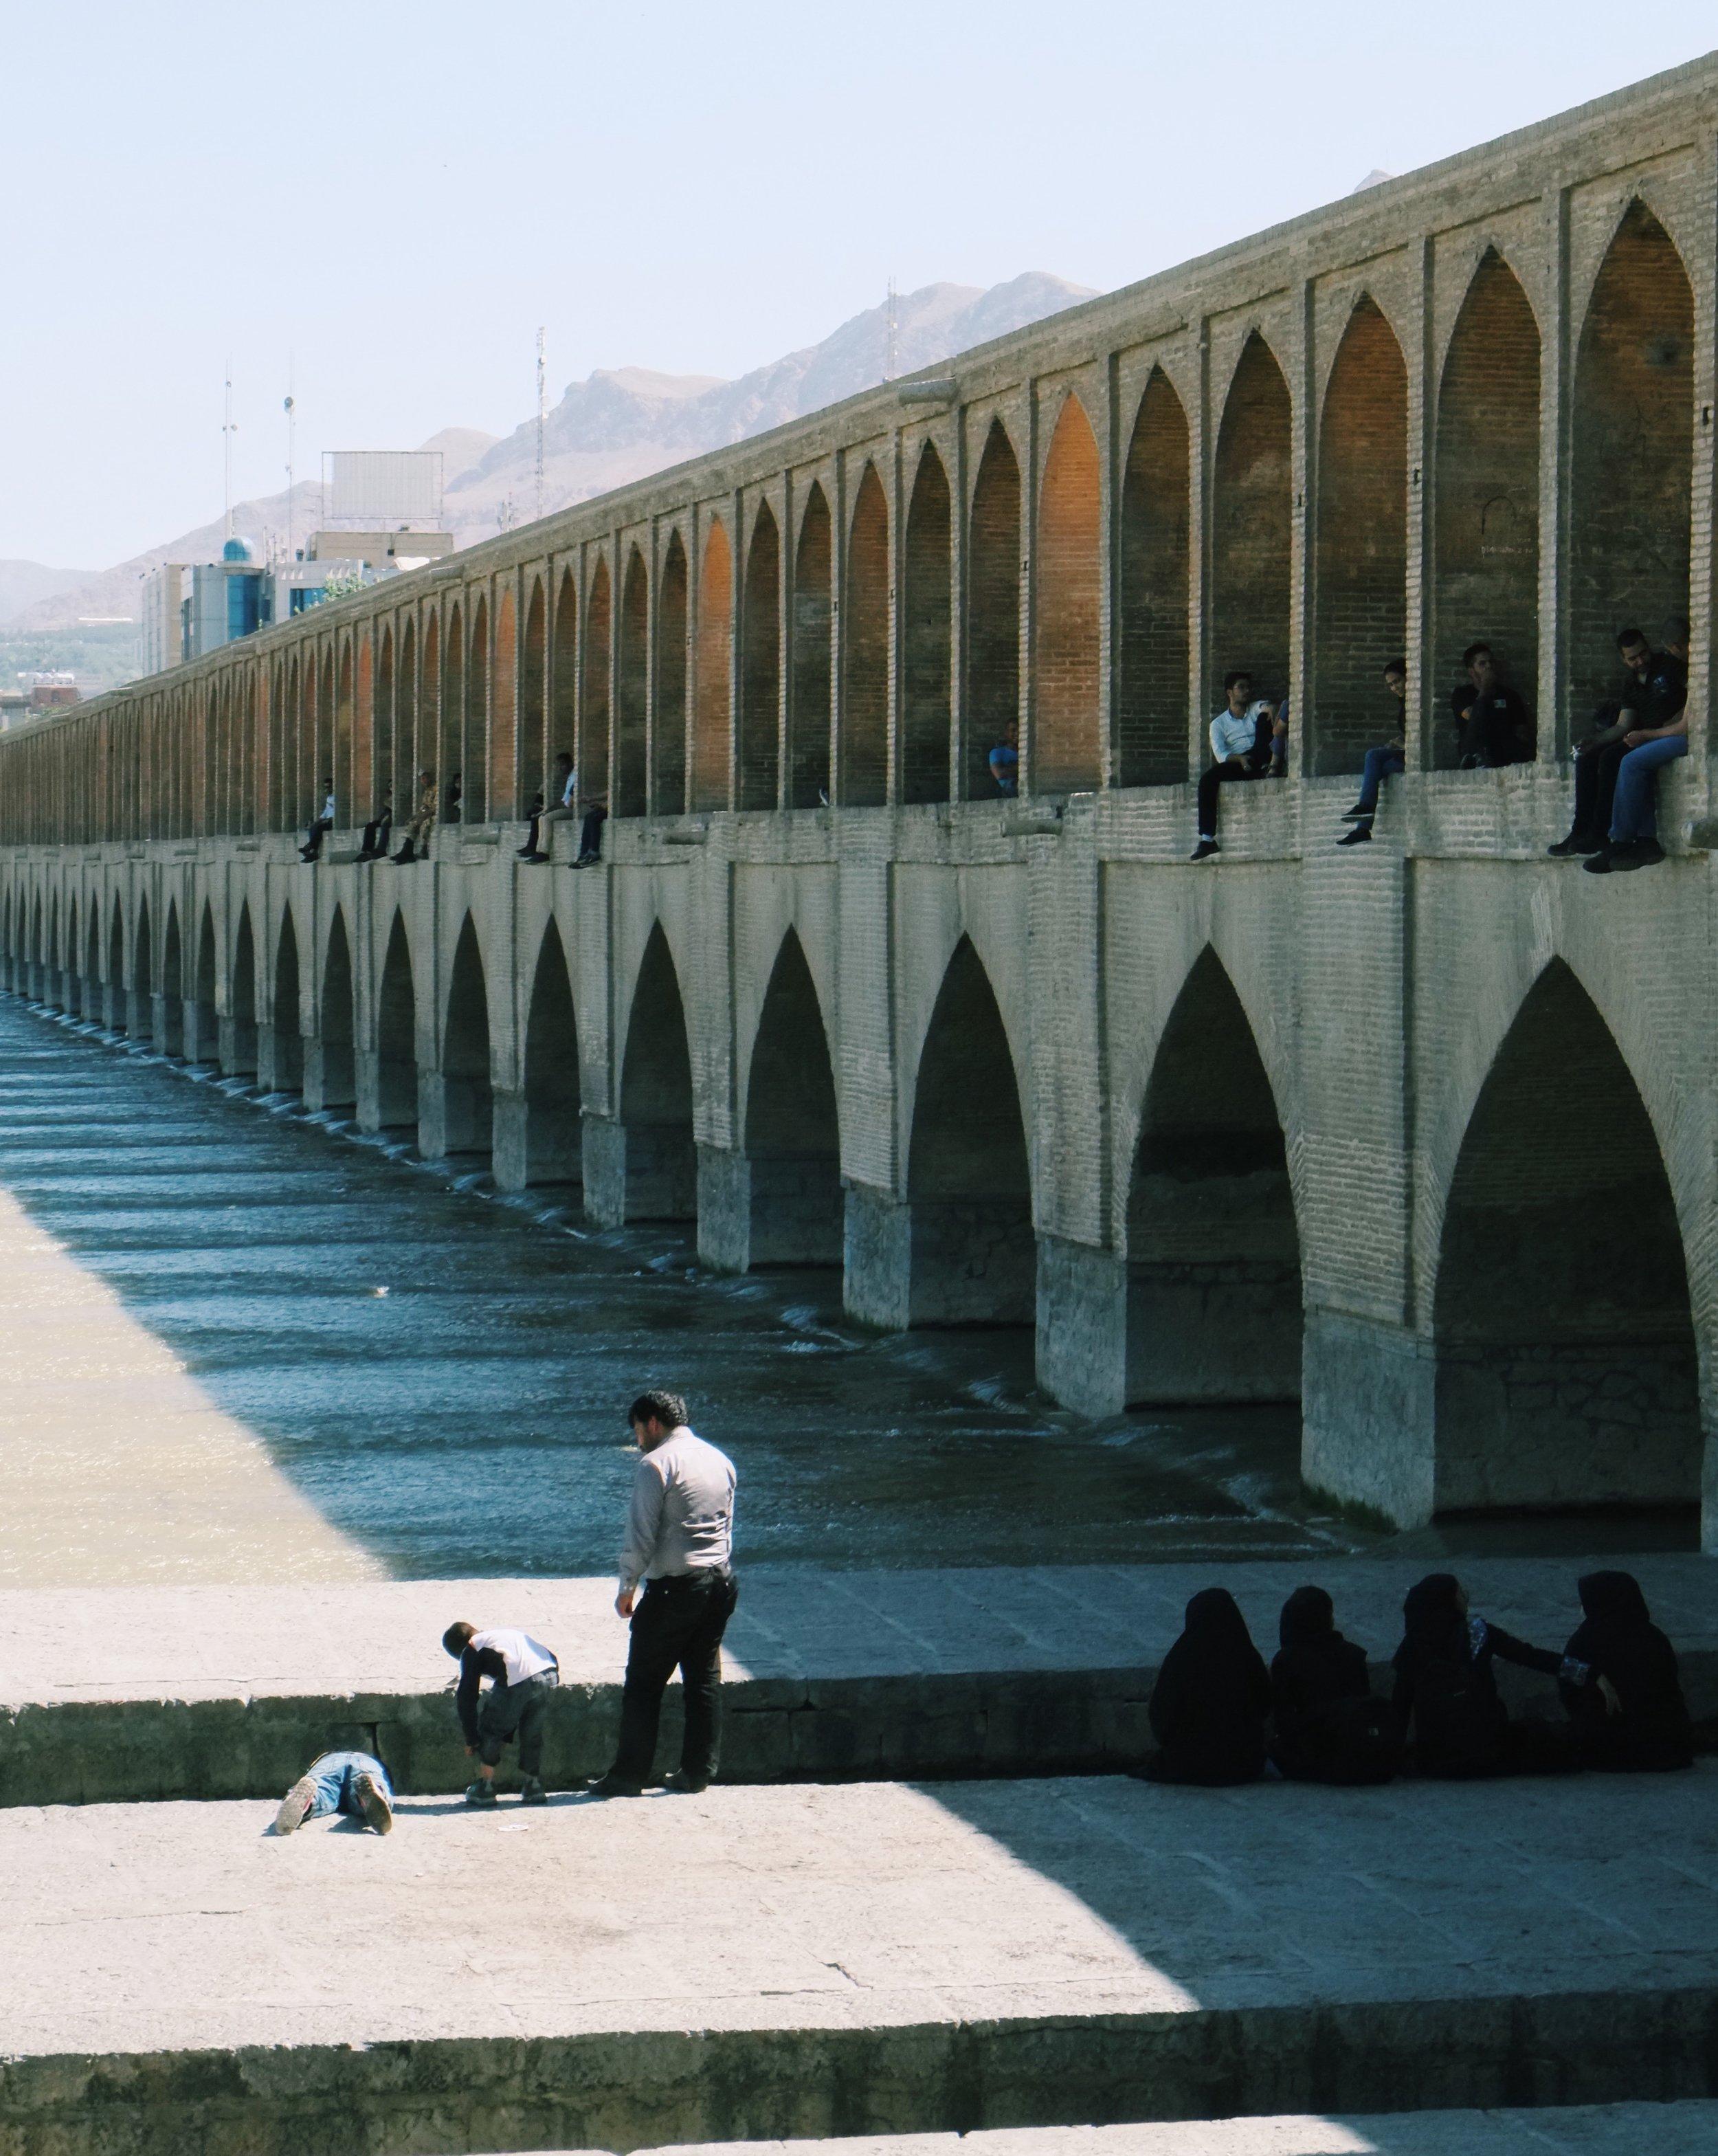 Si-o-se-pol Bridge in Esfahan in Iran by Joost Bastmeijer.jpeg